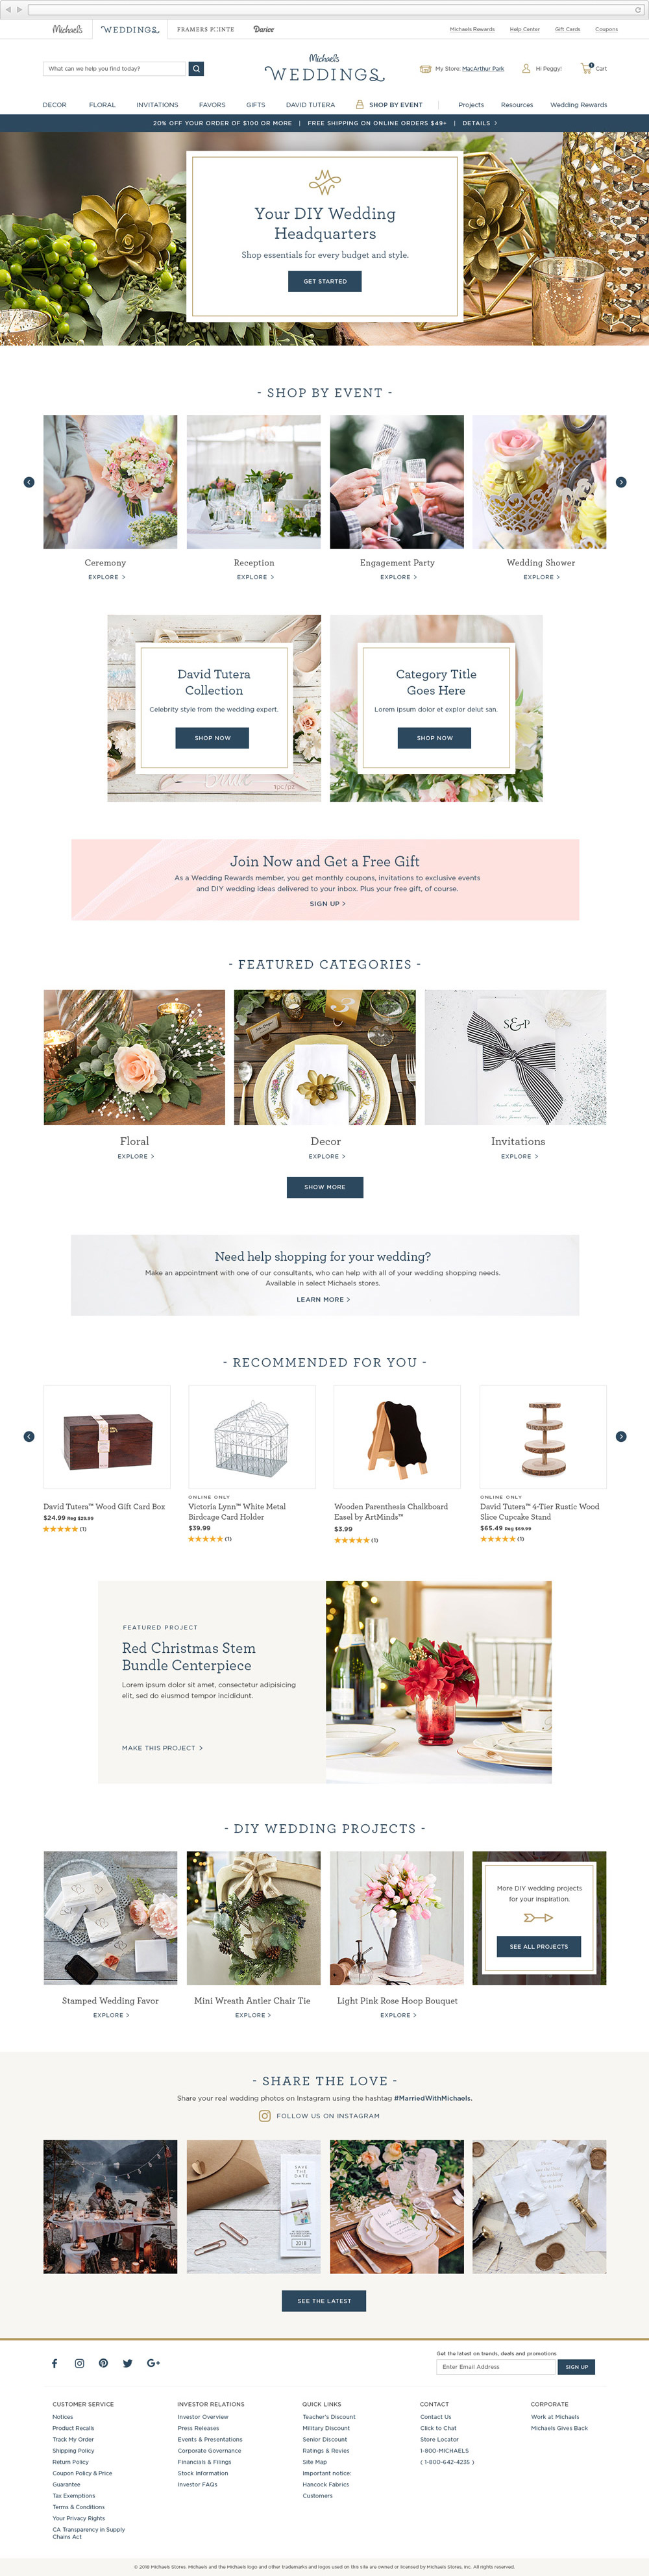 Michaels Weddings Matthew Potter Design Freelance Graphic